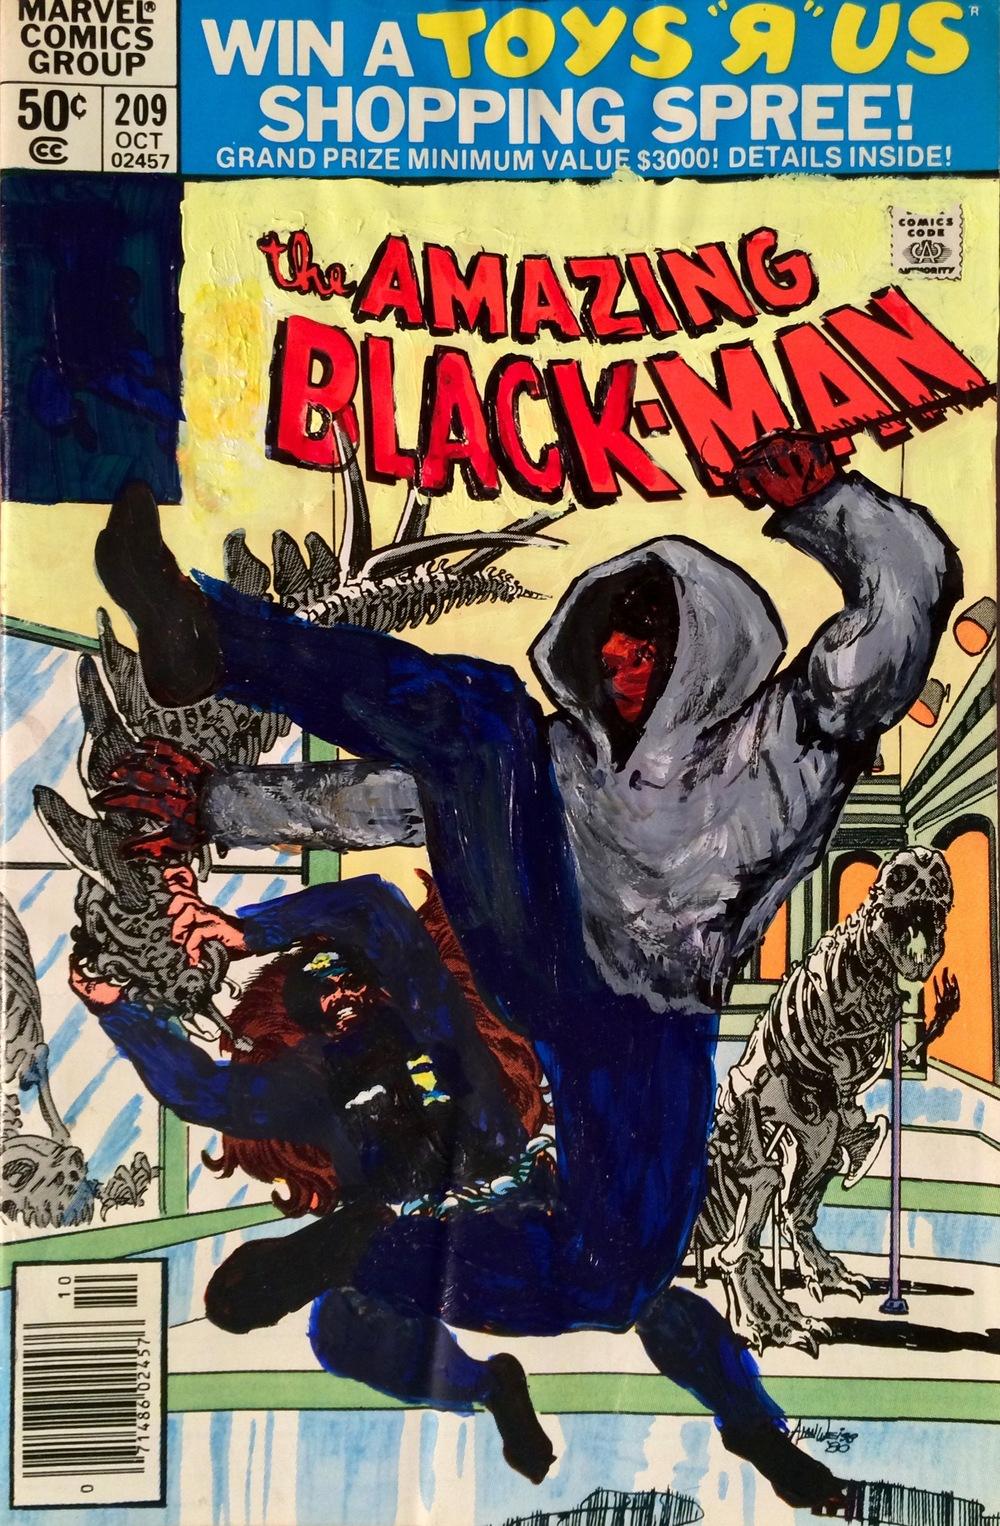 The Amazing Black-Man #209